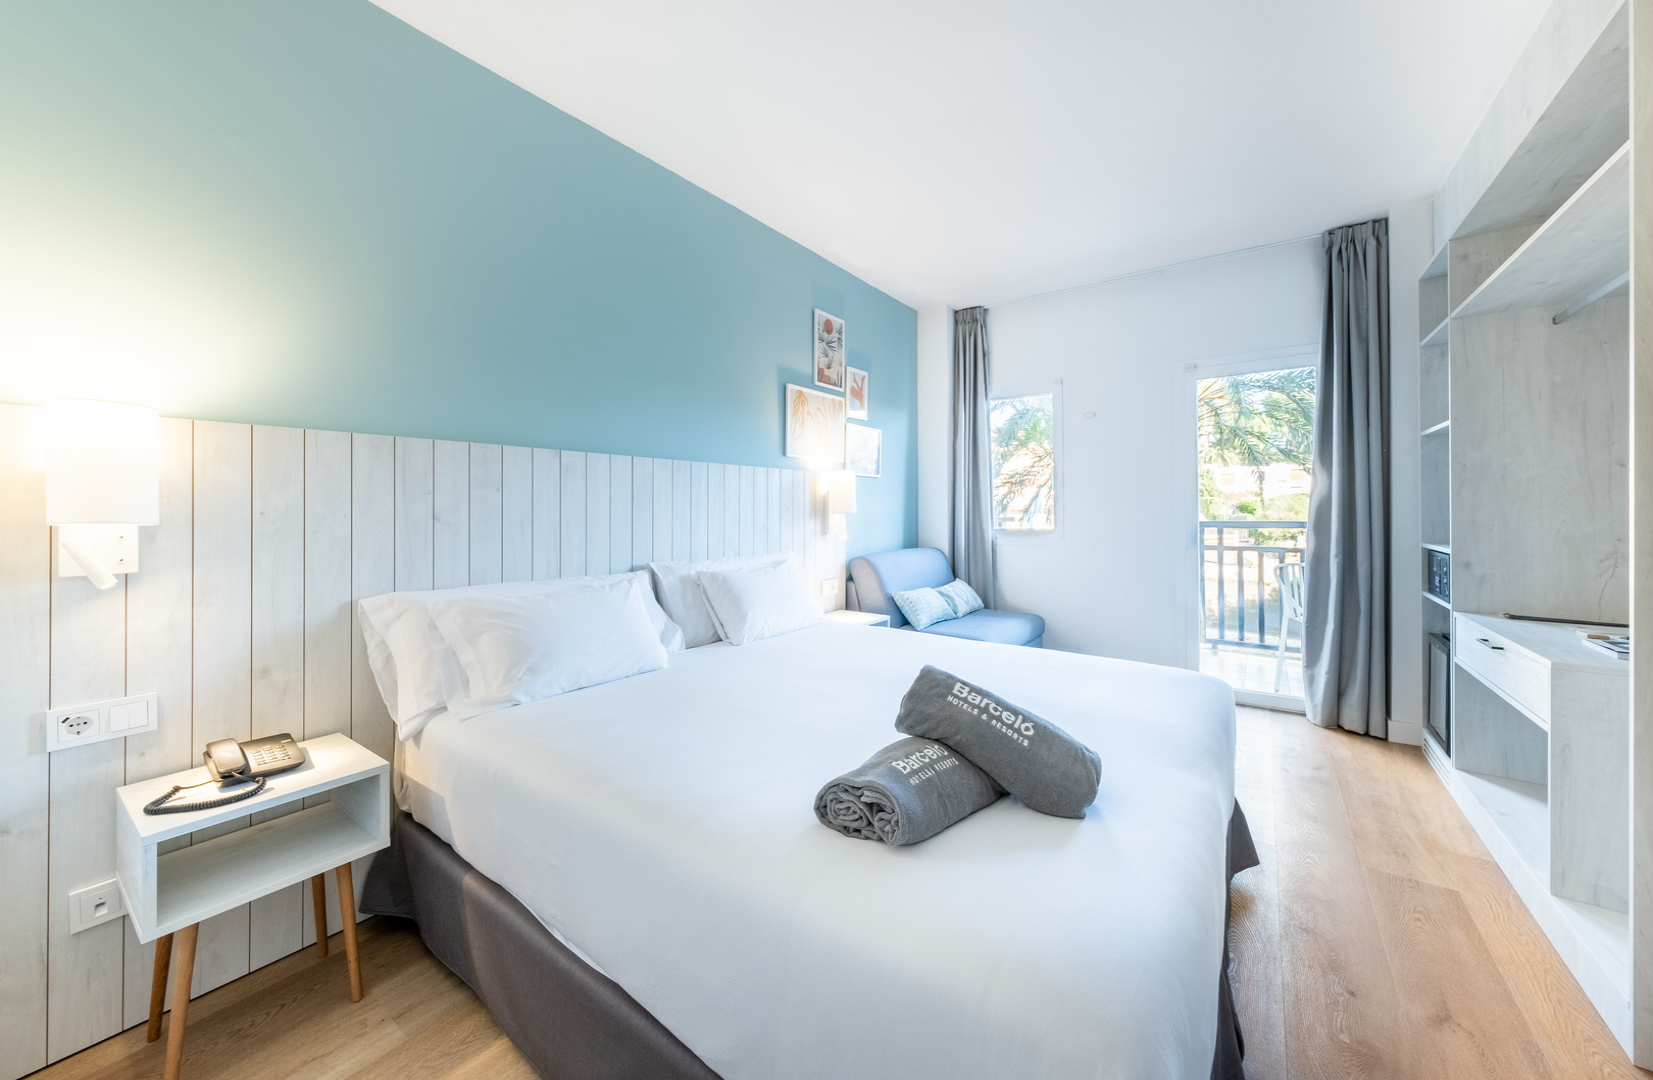 Hotel Barcelo Ponent Playa #5